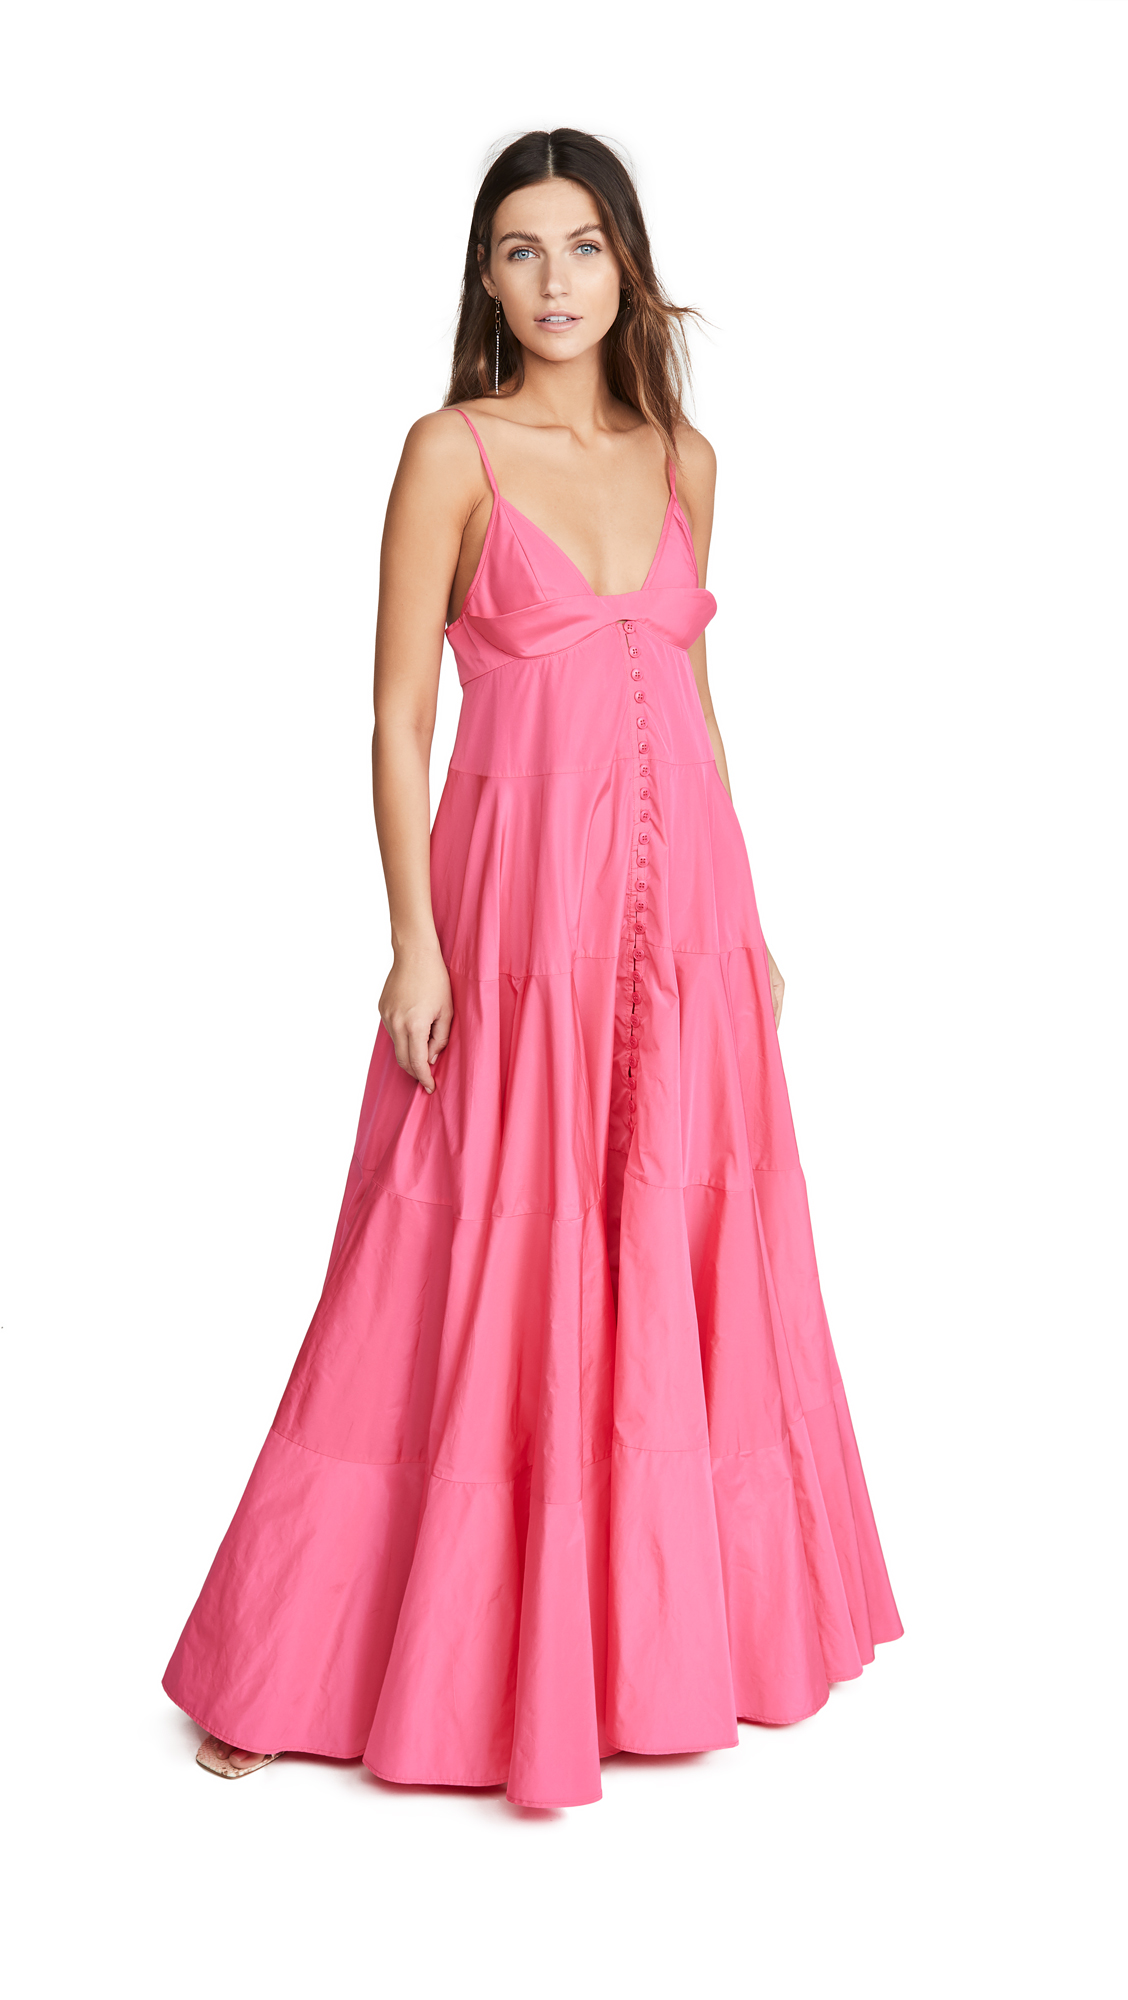 Jacquemus The Manosque Dress - 30% Off Sale